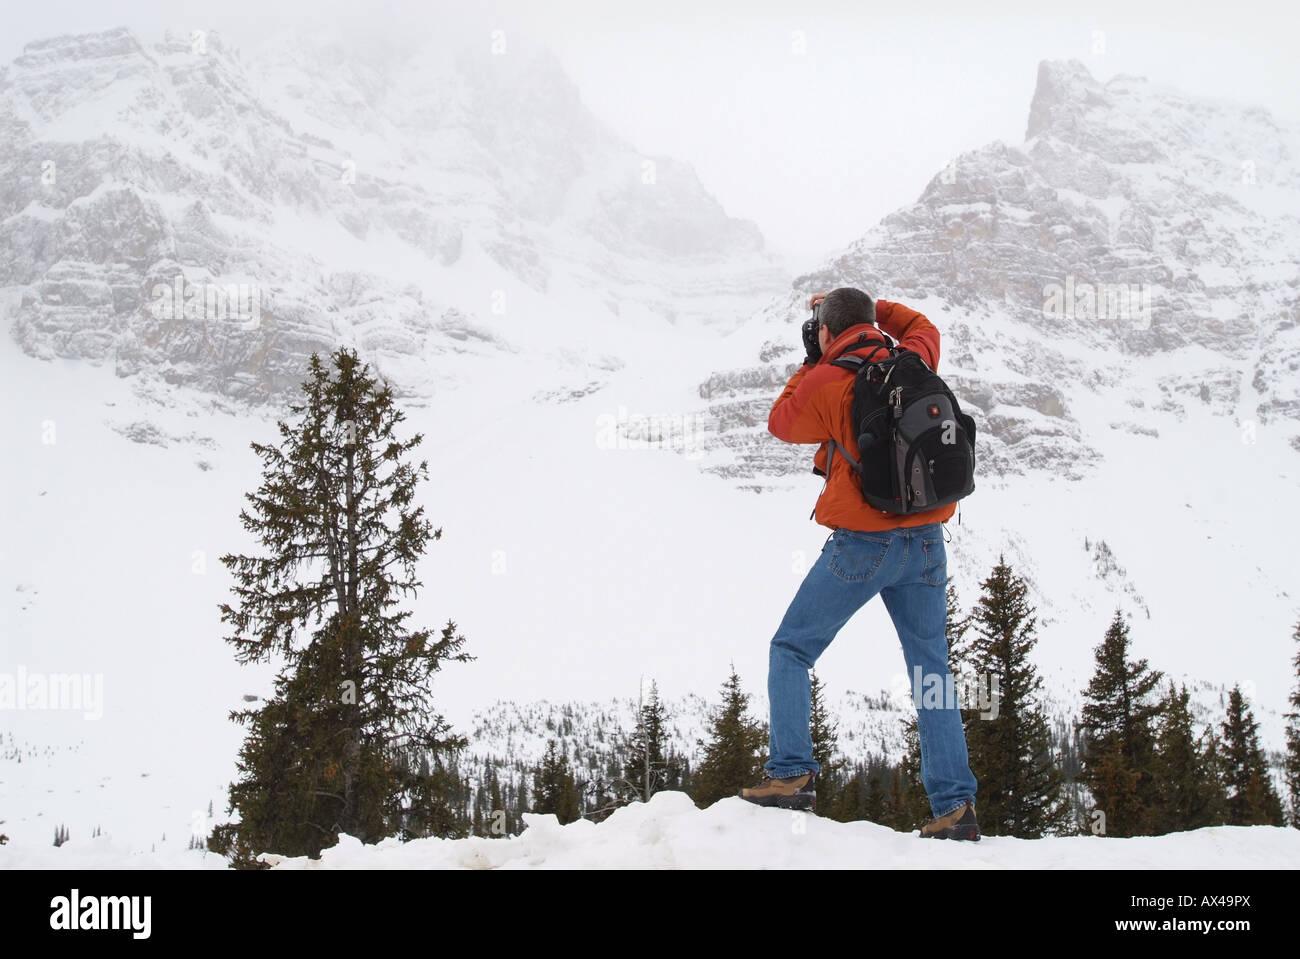 canada-alberta-banff-banff-national-park